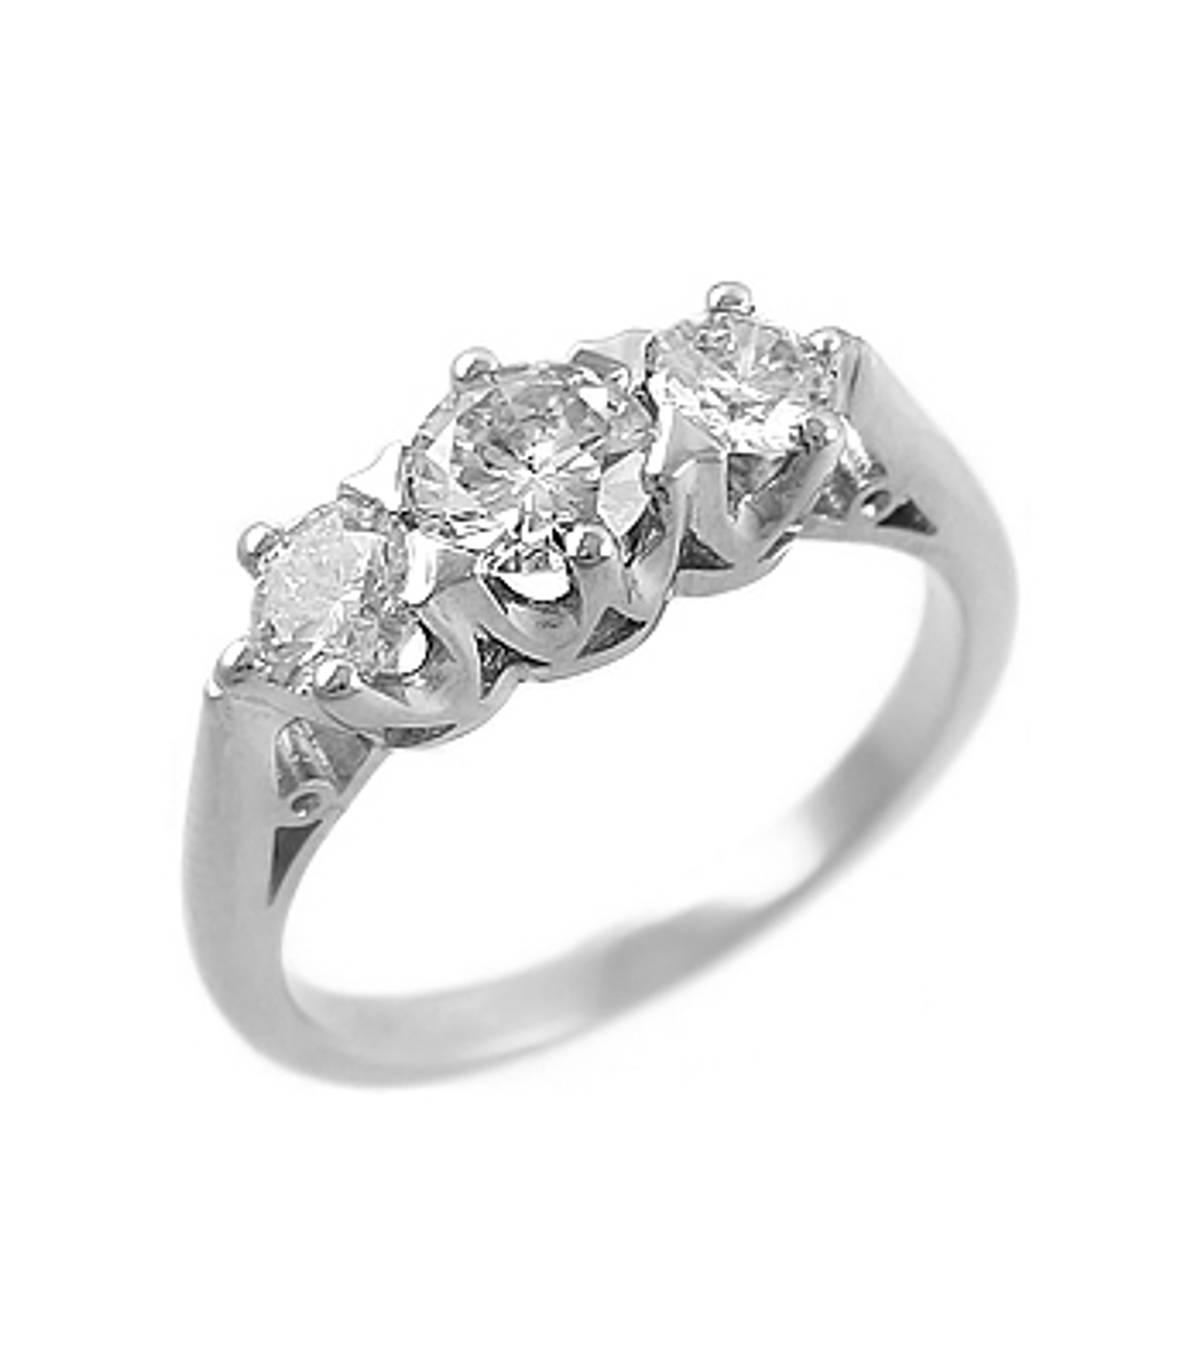 3 STONE DAIMOND RING Platinum 3st brilliant cut diamond graduated ringDETAILSCarat: centre diamond 0.40cts /side 2 diamonds total 0.60cts